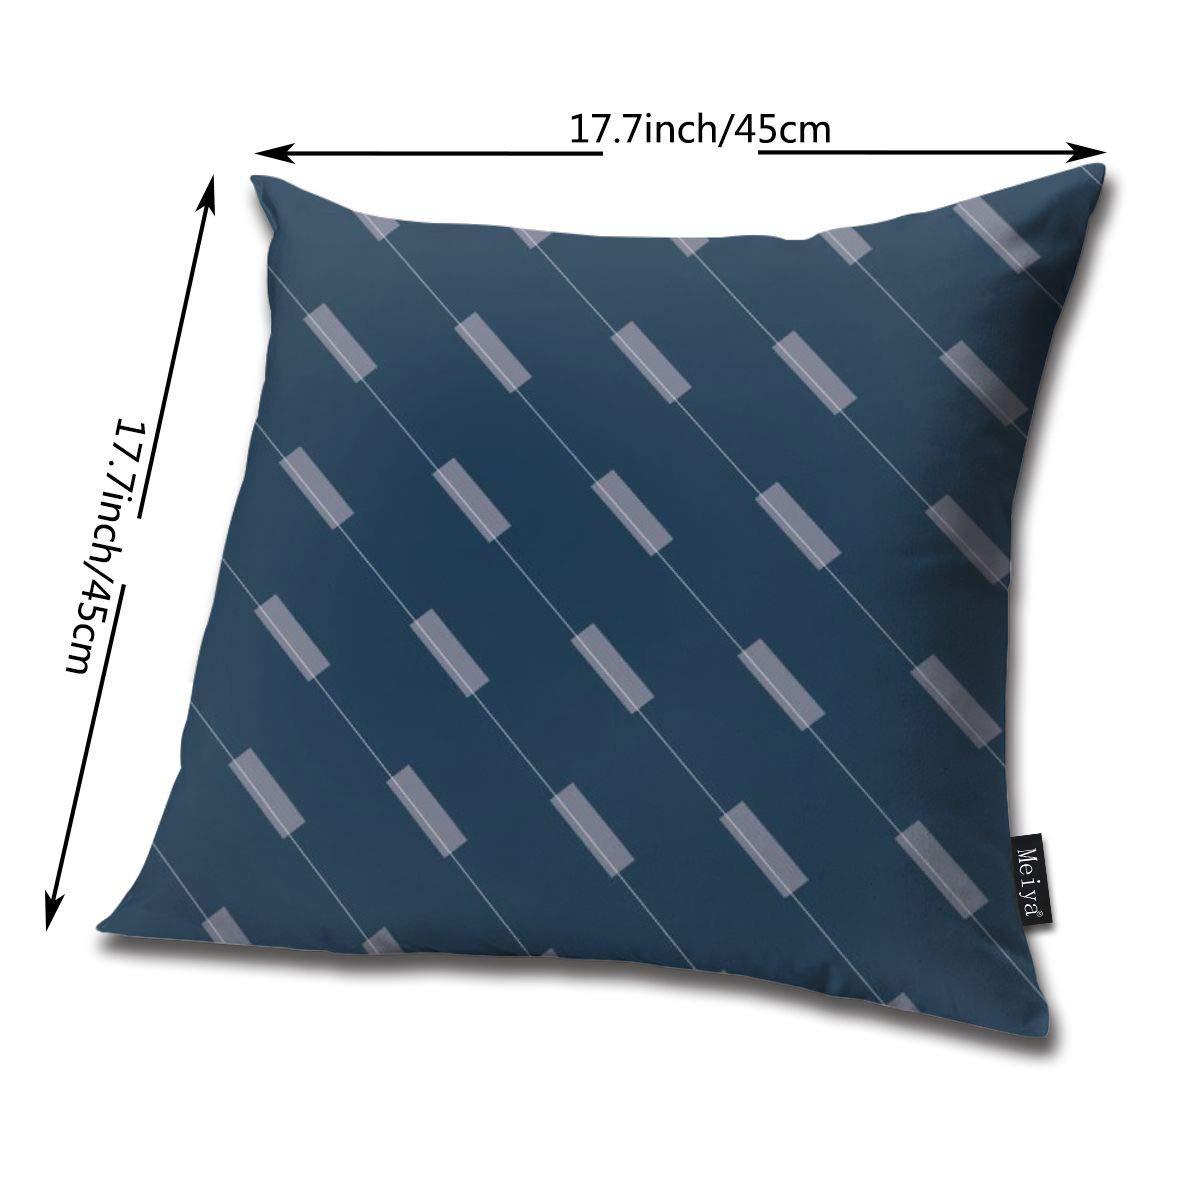 Amazon.com: Brecoy Bauhaus Lines Throw Pillow Cushion Cover ...